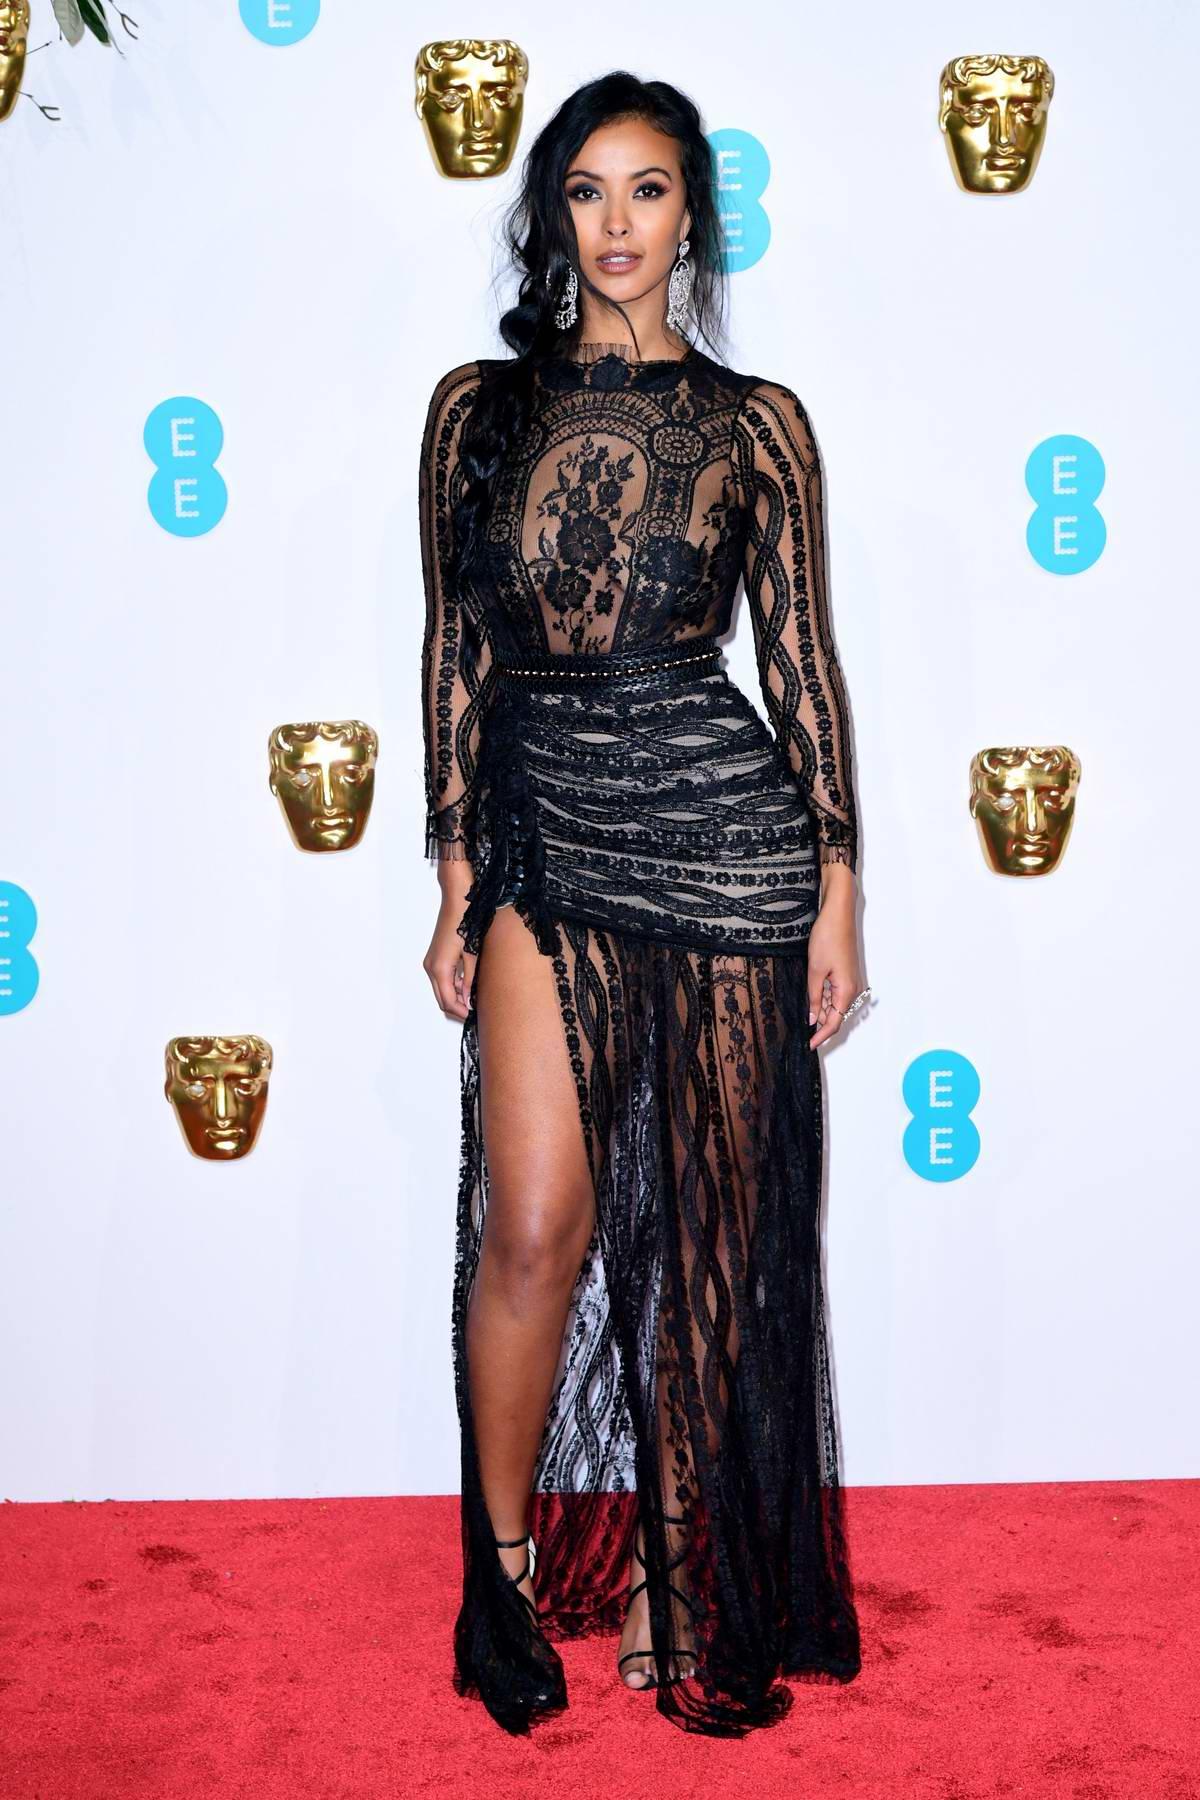 Maya Jama attends the 72nd EE British Academy Film Awards (BAFTA 2019) at Royal Albert Hall in London, UK